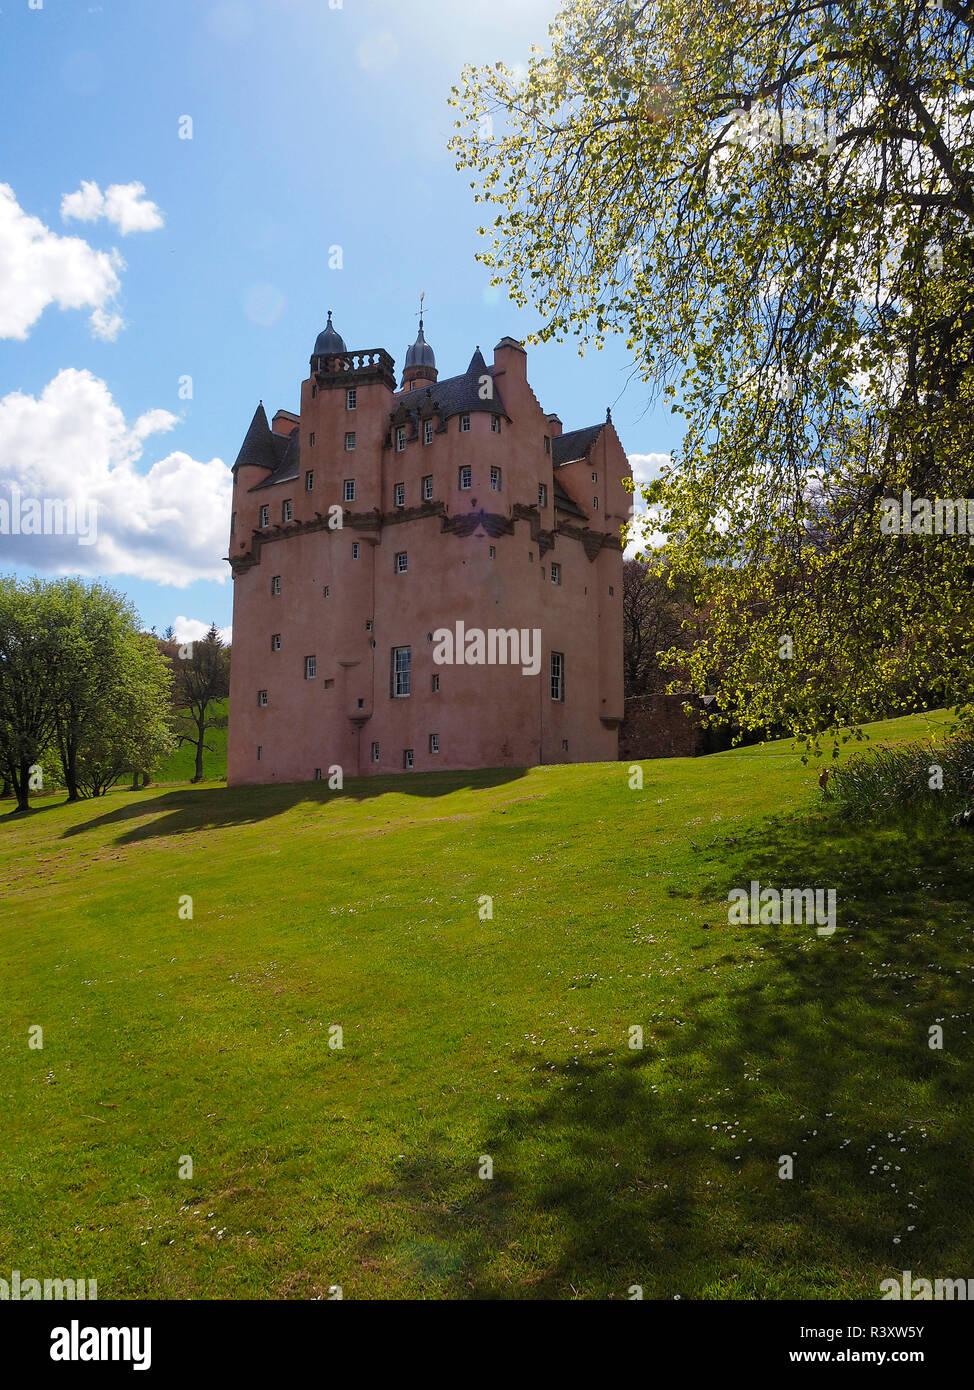 CRAIGIEVAR CASTLE Scotland - Stock Image